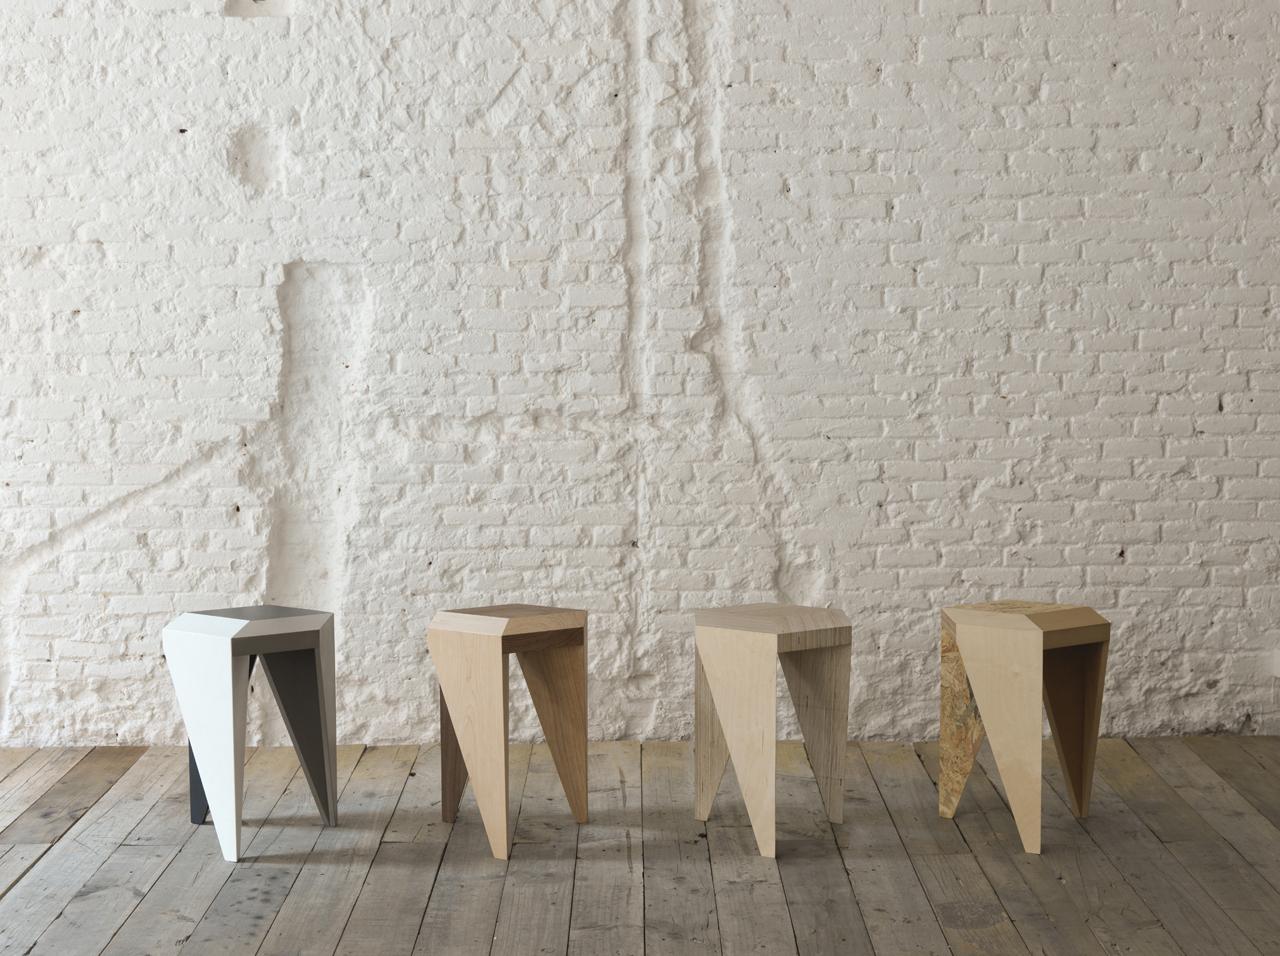 Muebles Madera Tag Plataforma Arquitectura # Muebles Catalan